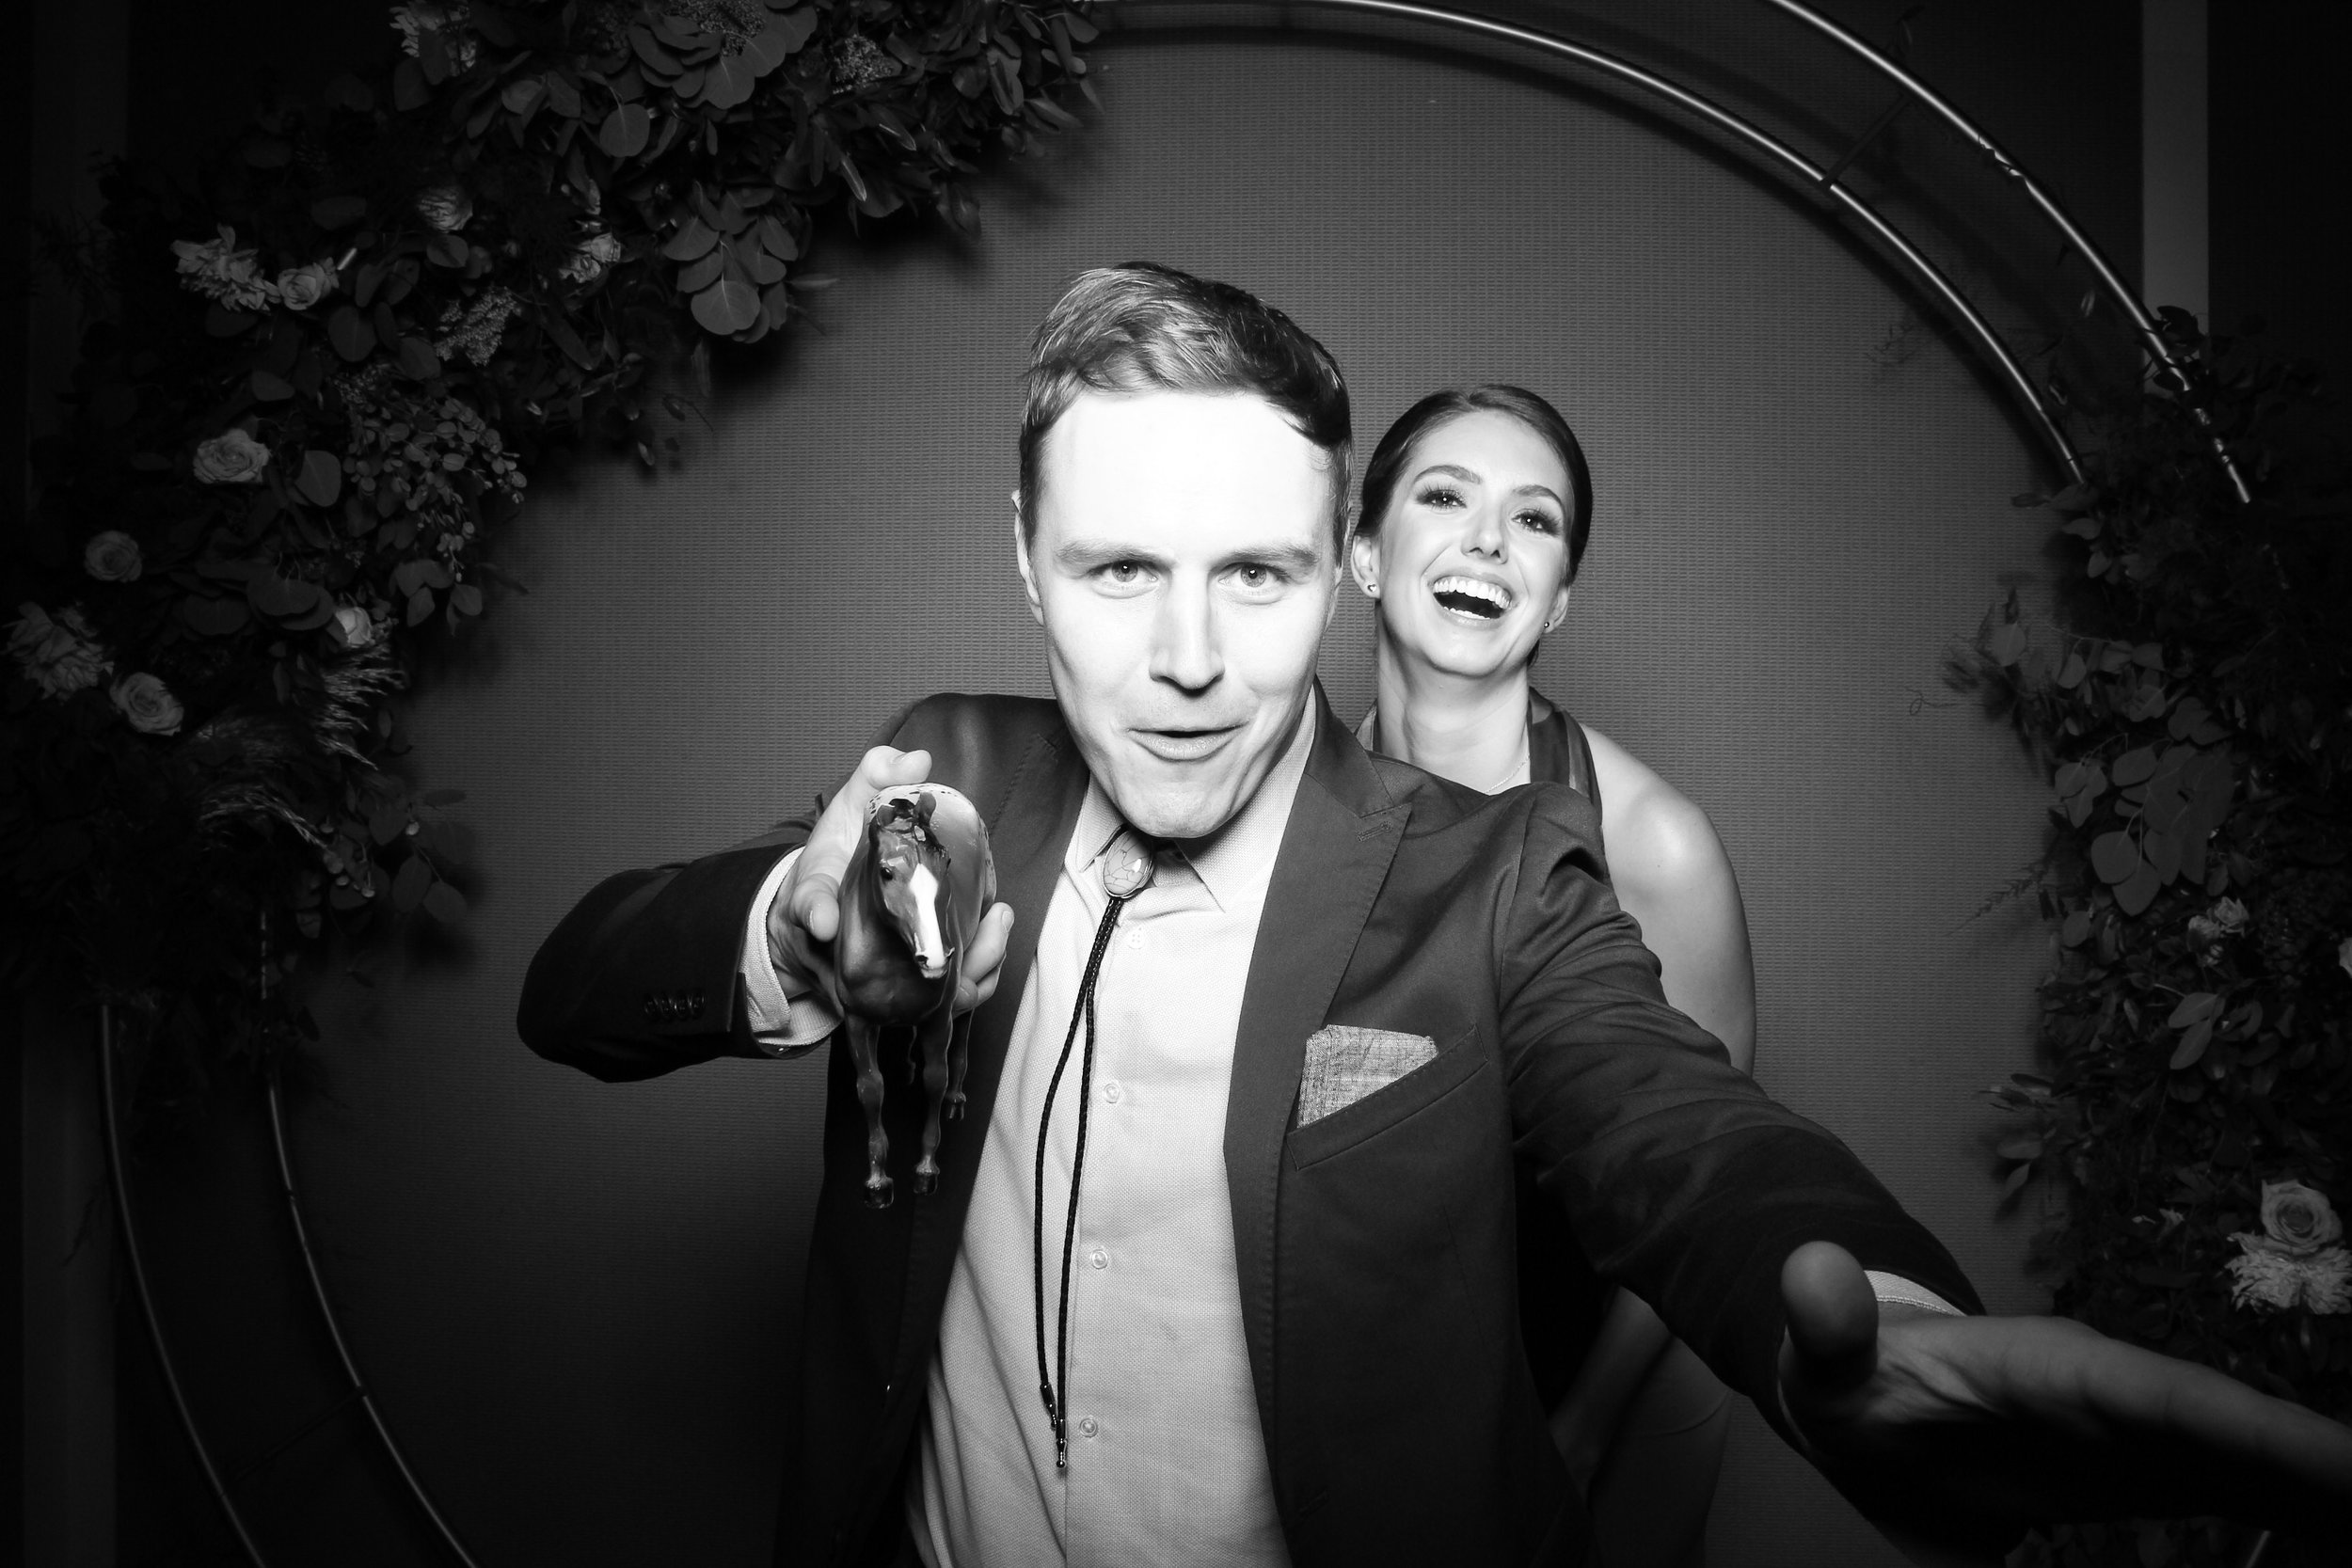 Metropolis_Ballroom_Wedding_Arlington_Heights_Photo_Booth_07.jpg